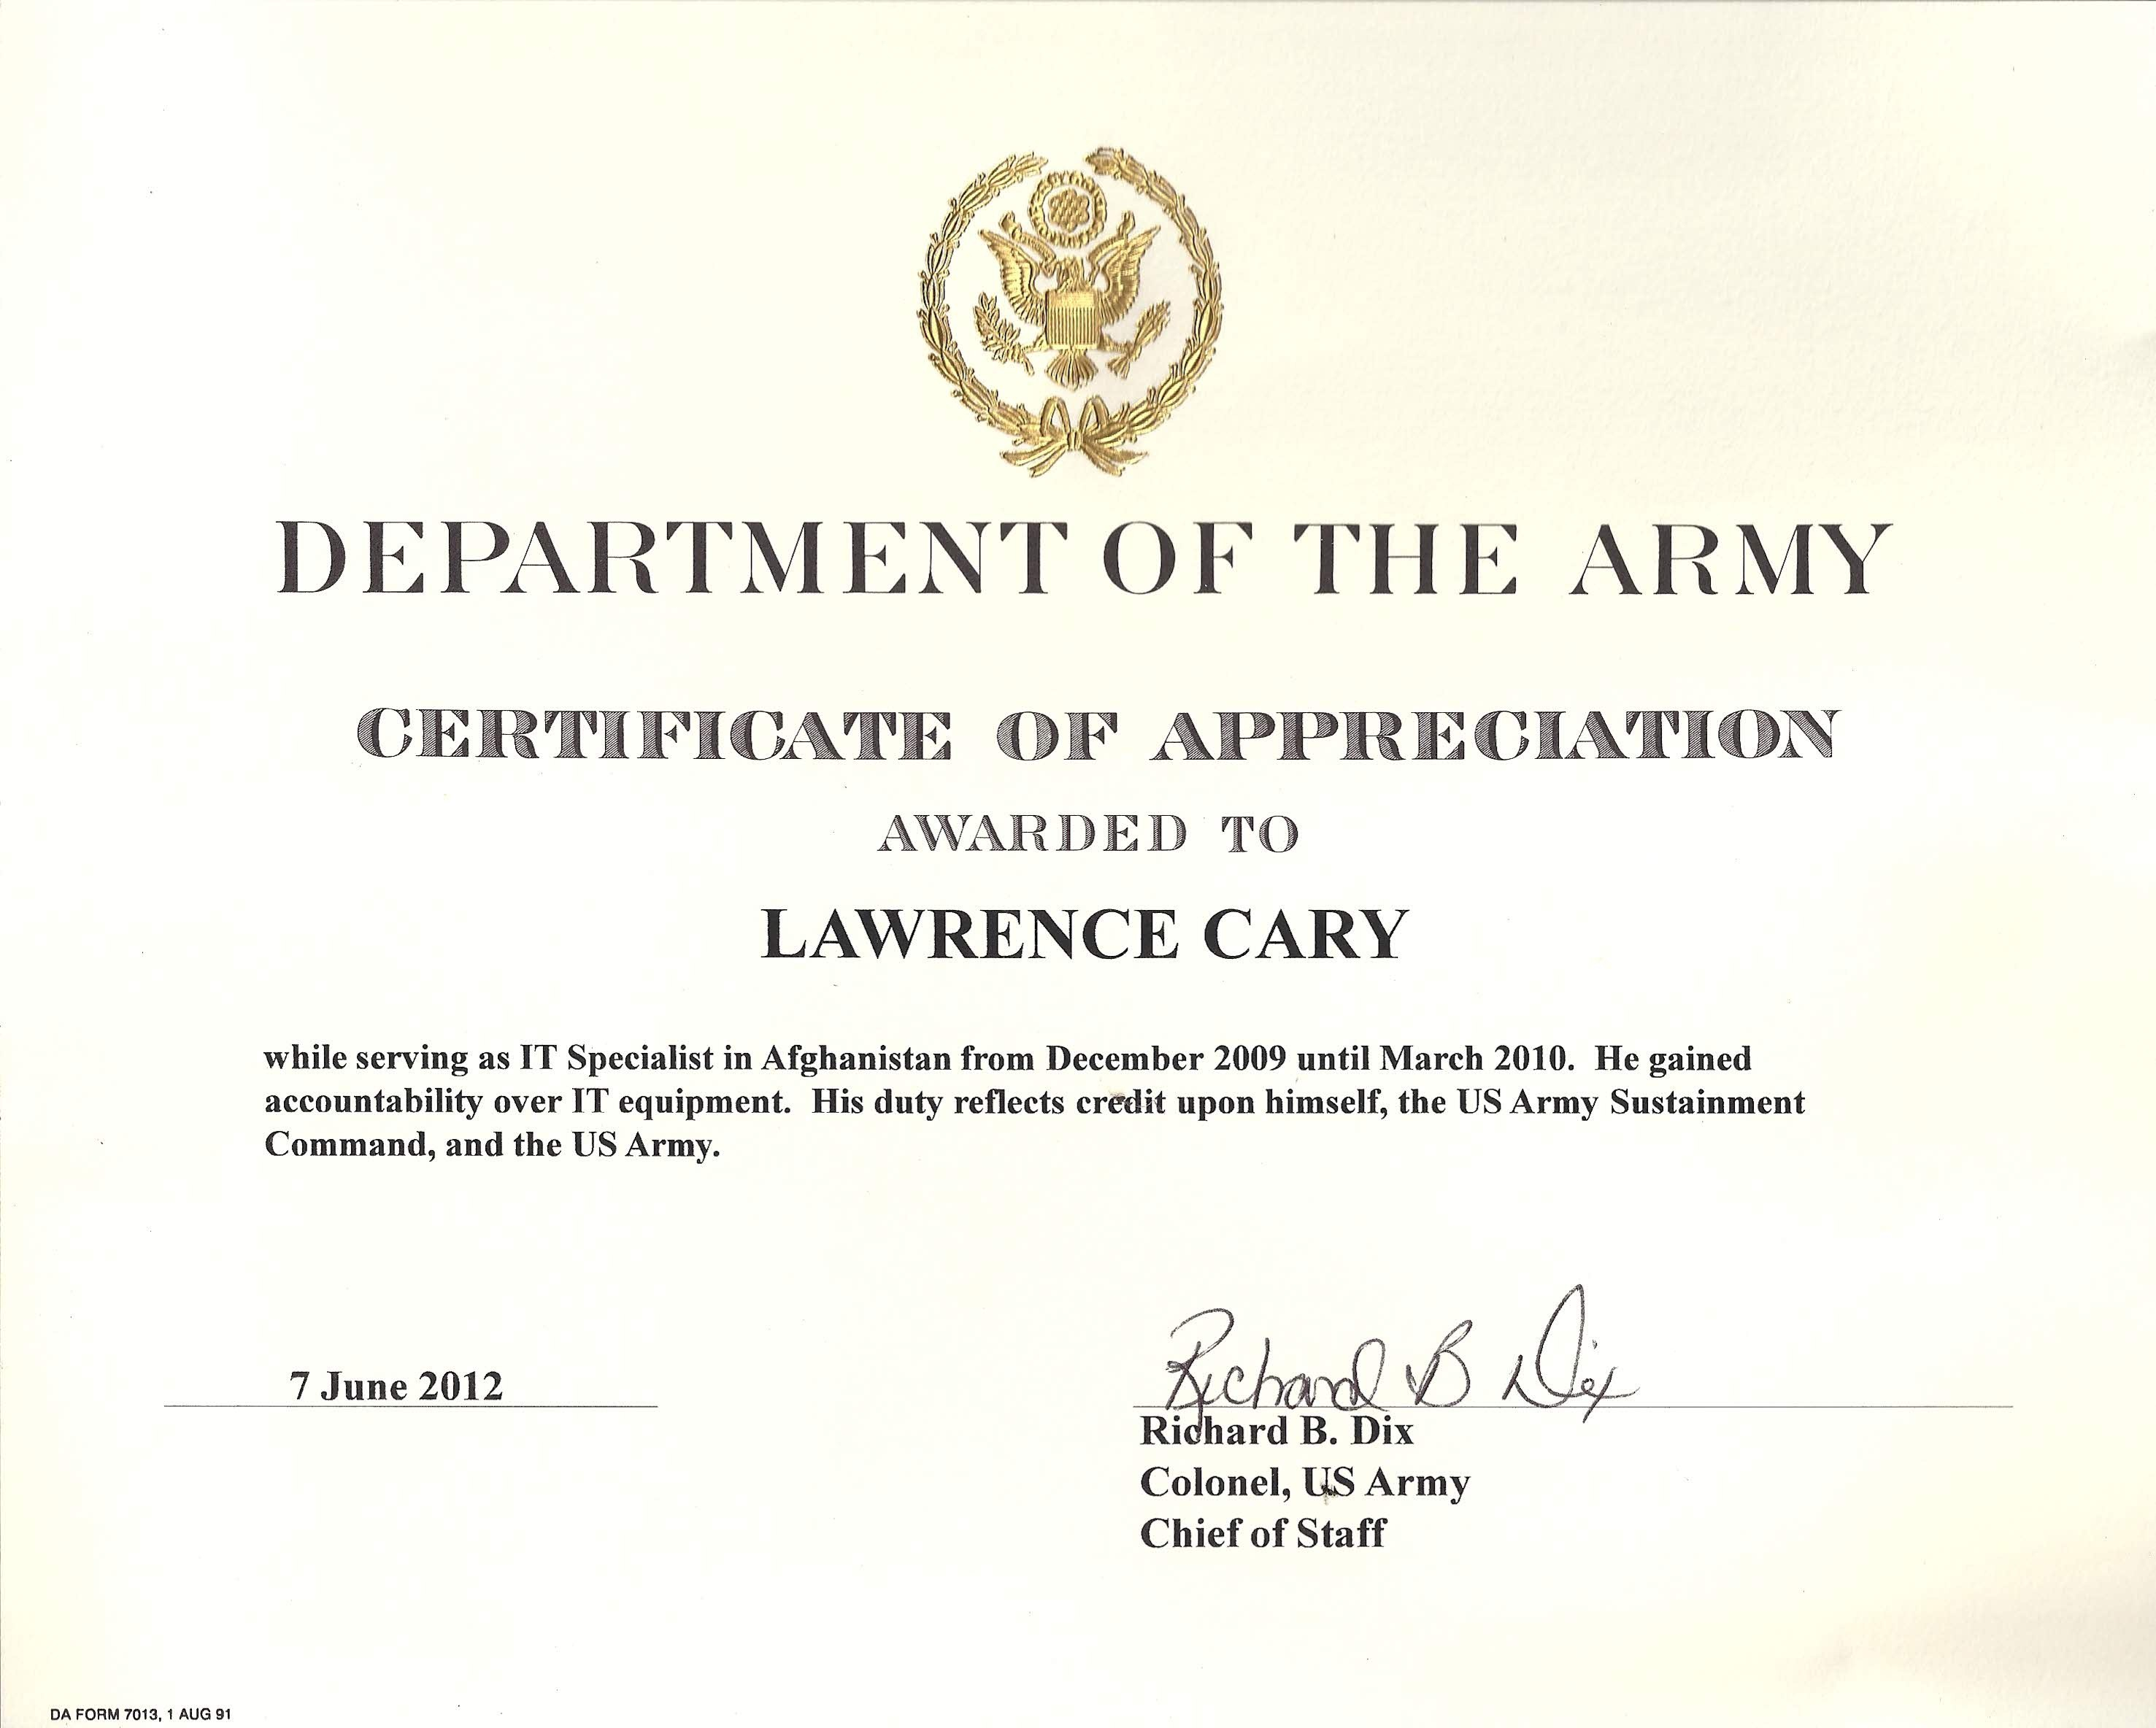 Army Appreciation Certificate Templates  Pdf Docx  Free In Army Certificate Of Appreciation Template